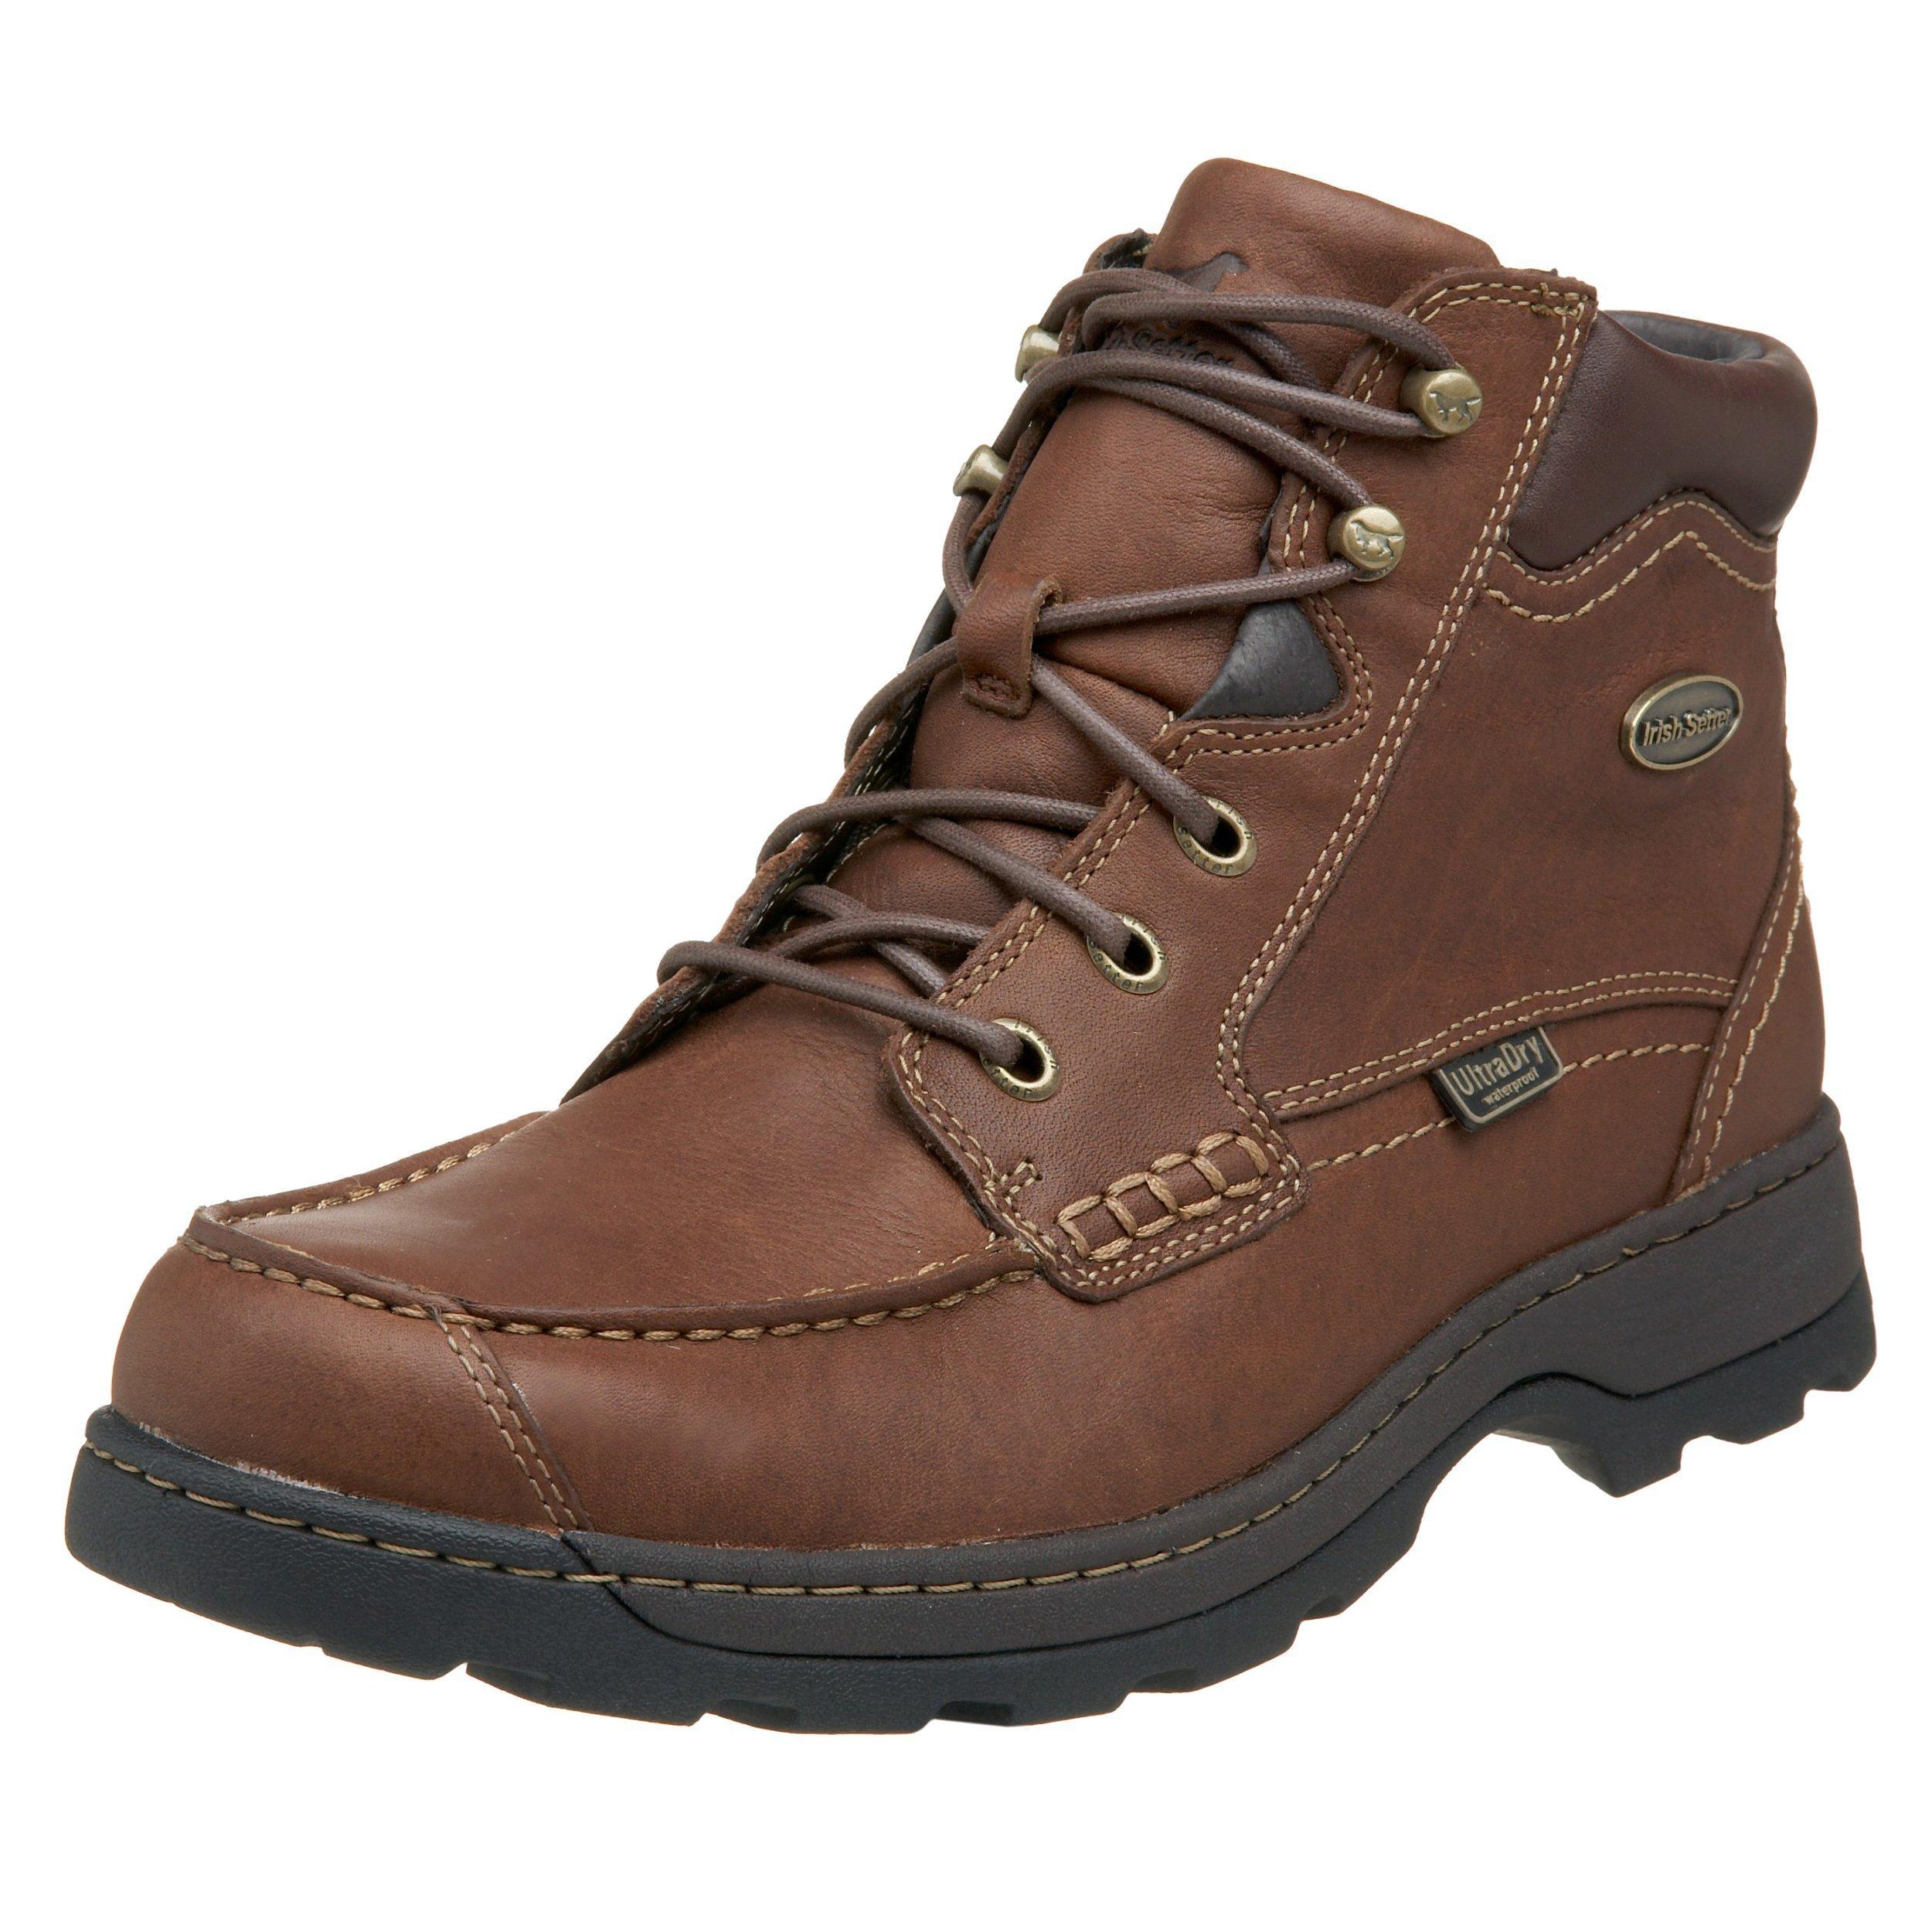 Irish Setter Men's 3875 Soft Paw Waterproof Chukka Casual Shoe,Brown,10.5 D US